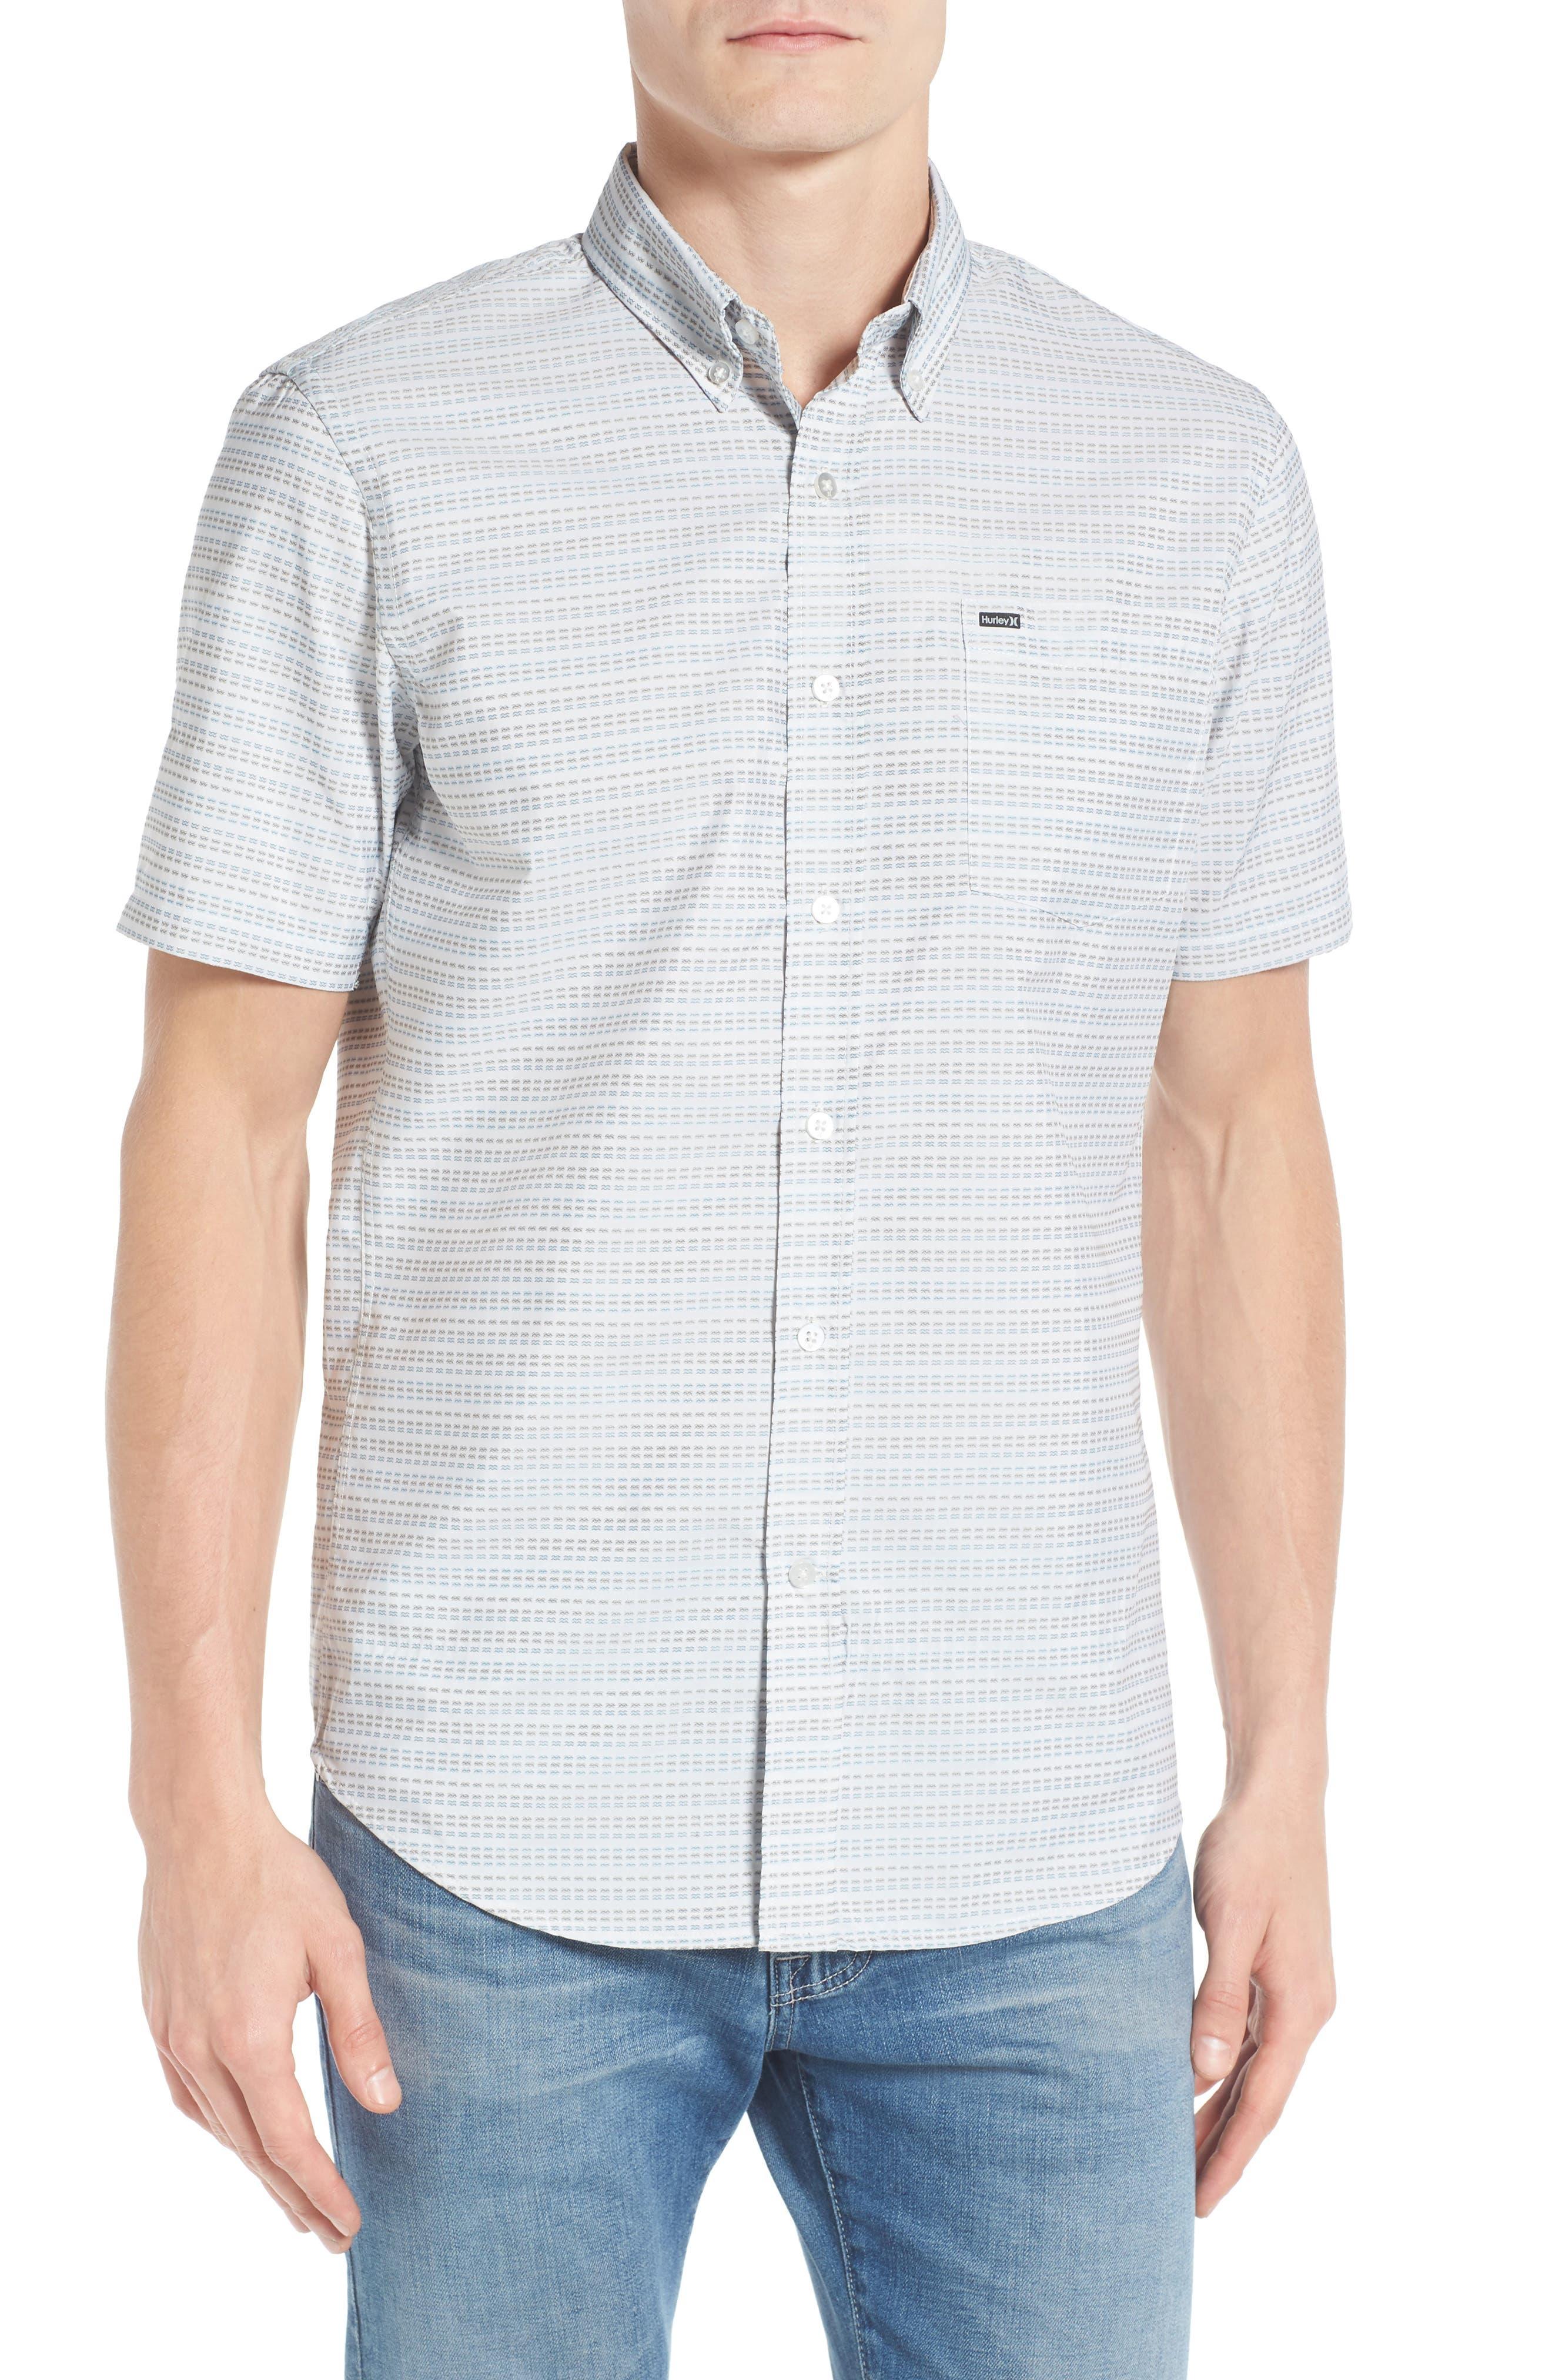 HURLEY Sound Dri-FIT Print Woven Shirt